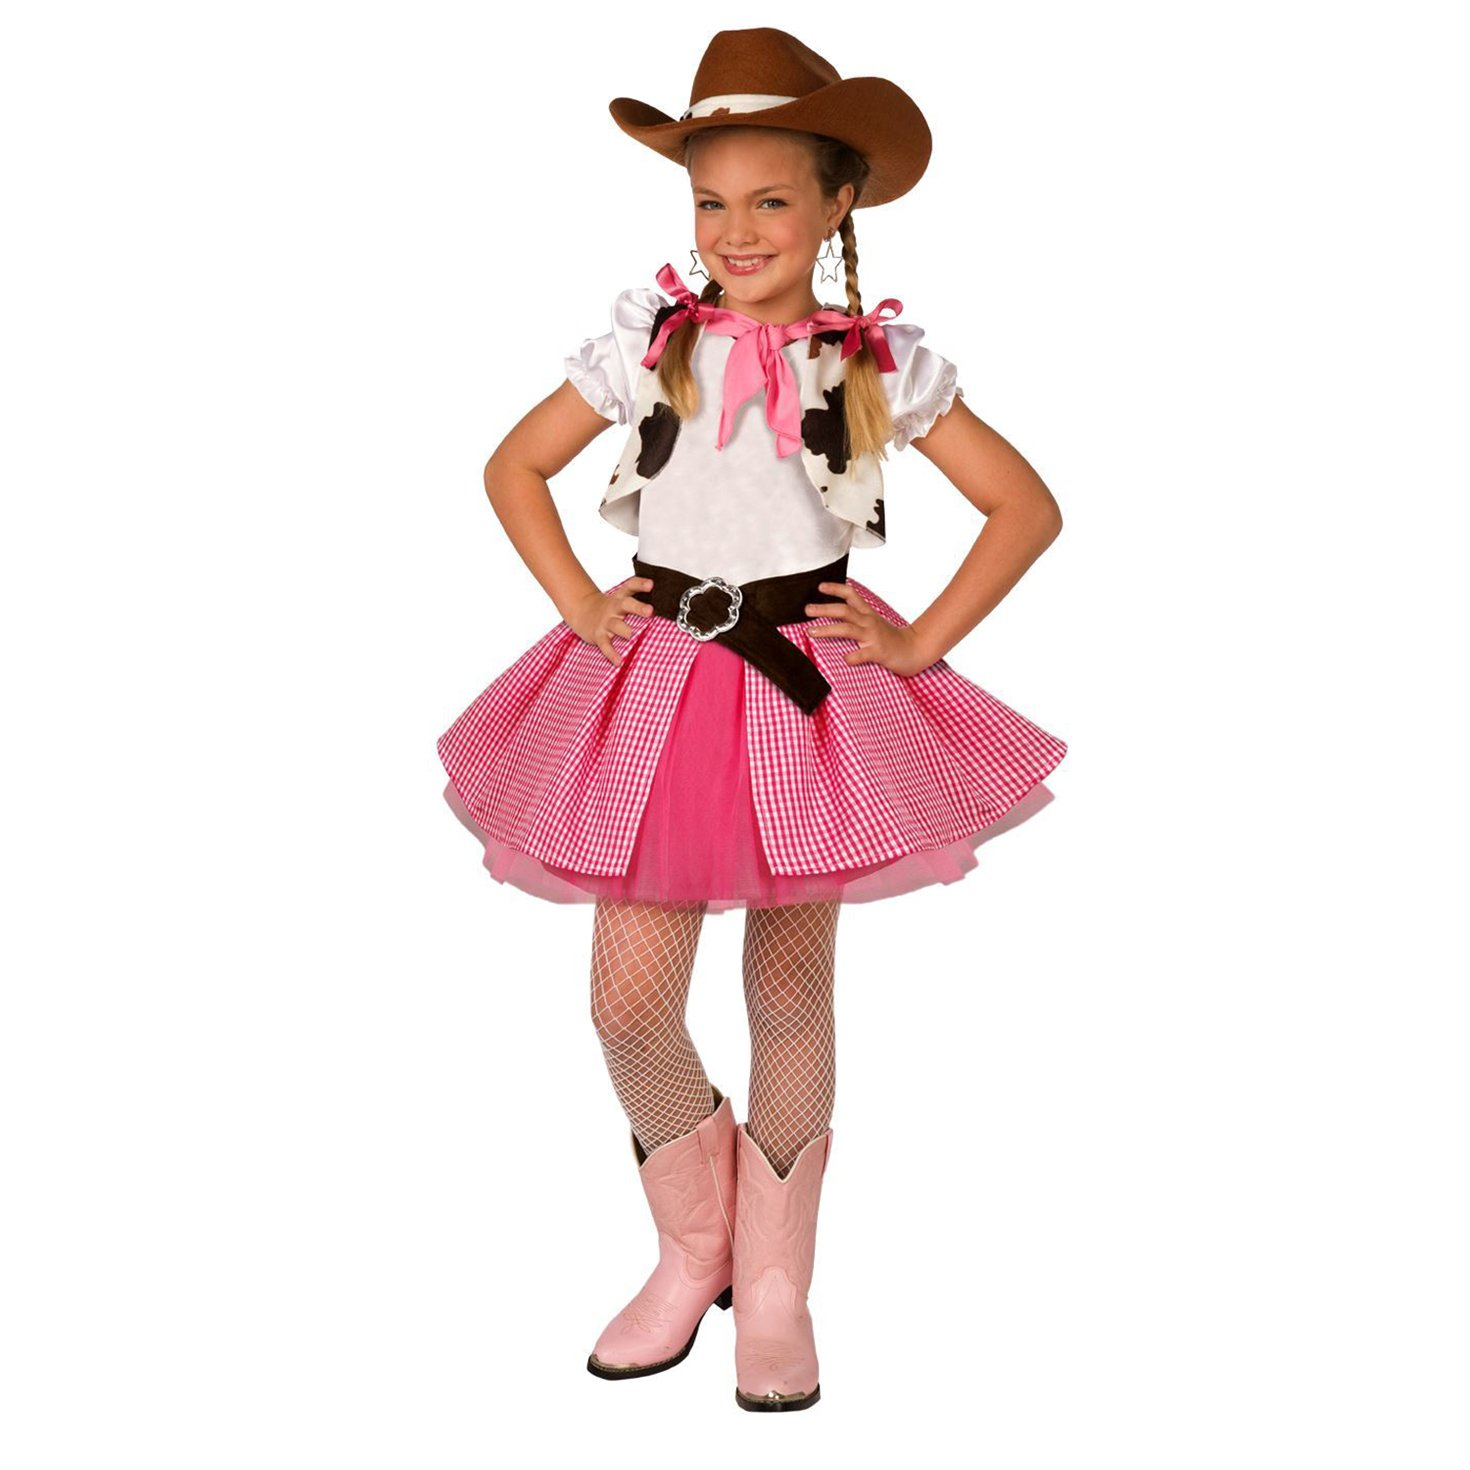 Kids Cowgirl Costume Cute Girls Pink